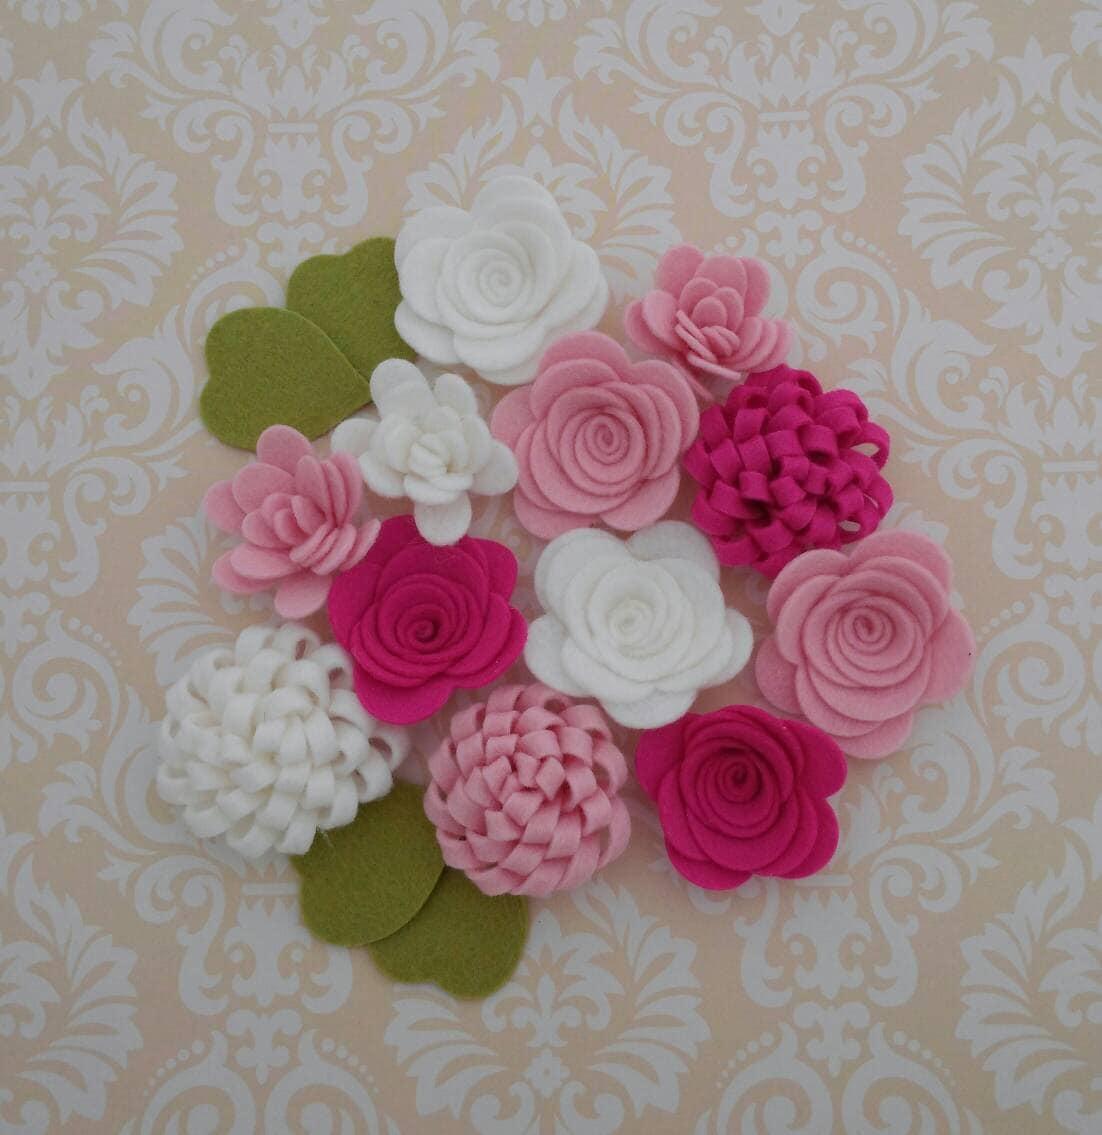 Handmade Wool Felt Flowers Carnation Pink Shocking Pink And Etsy